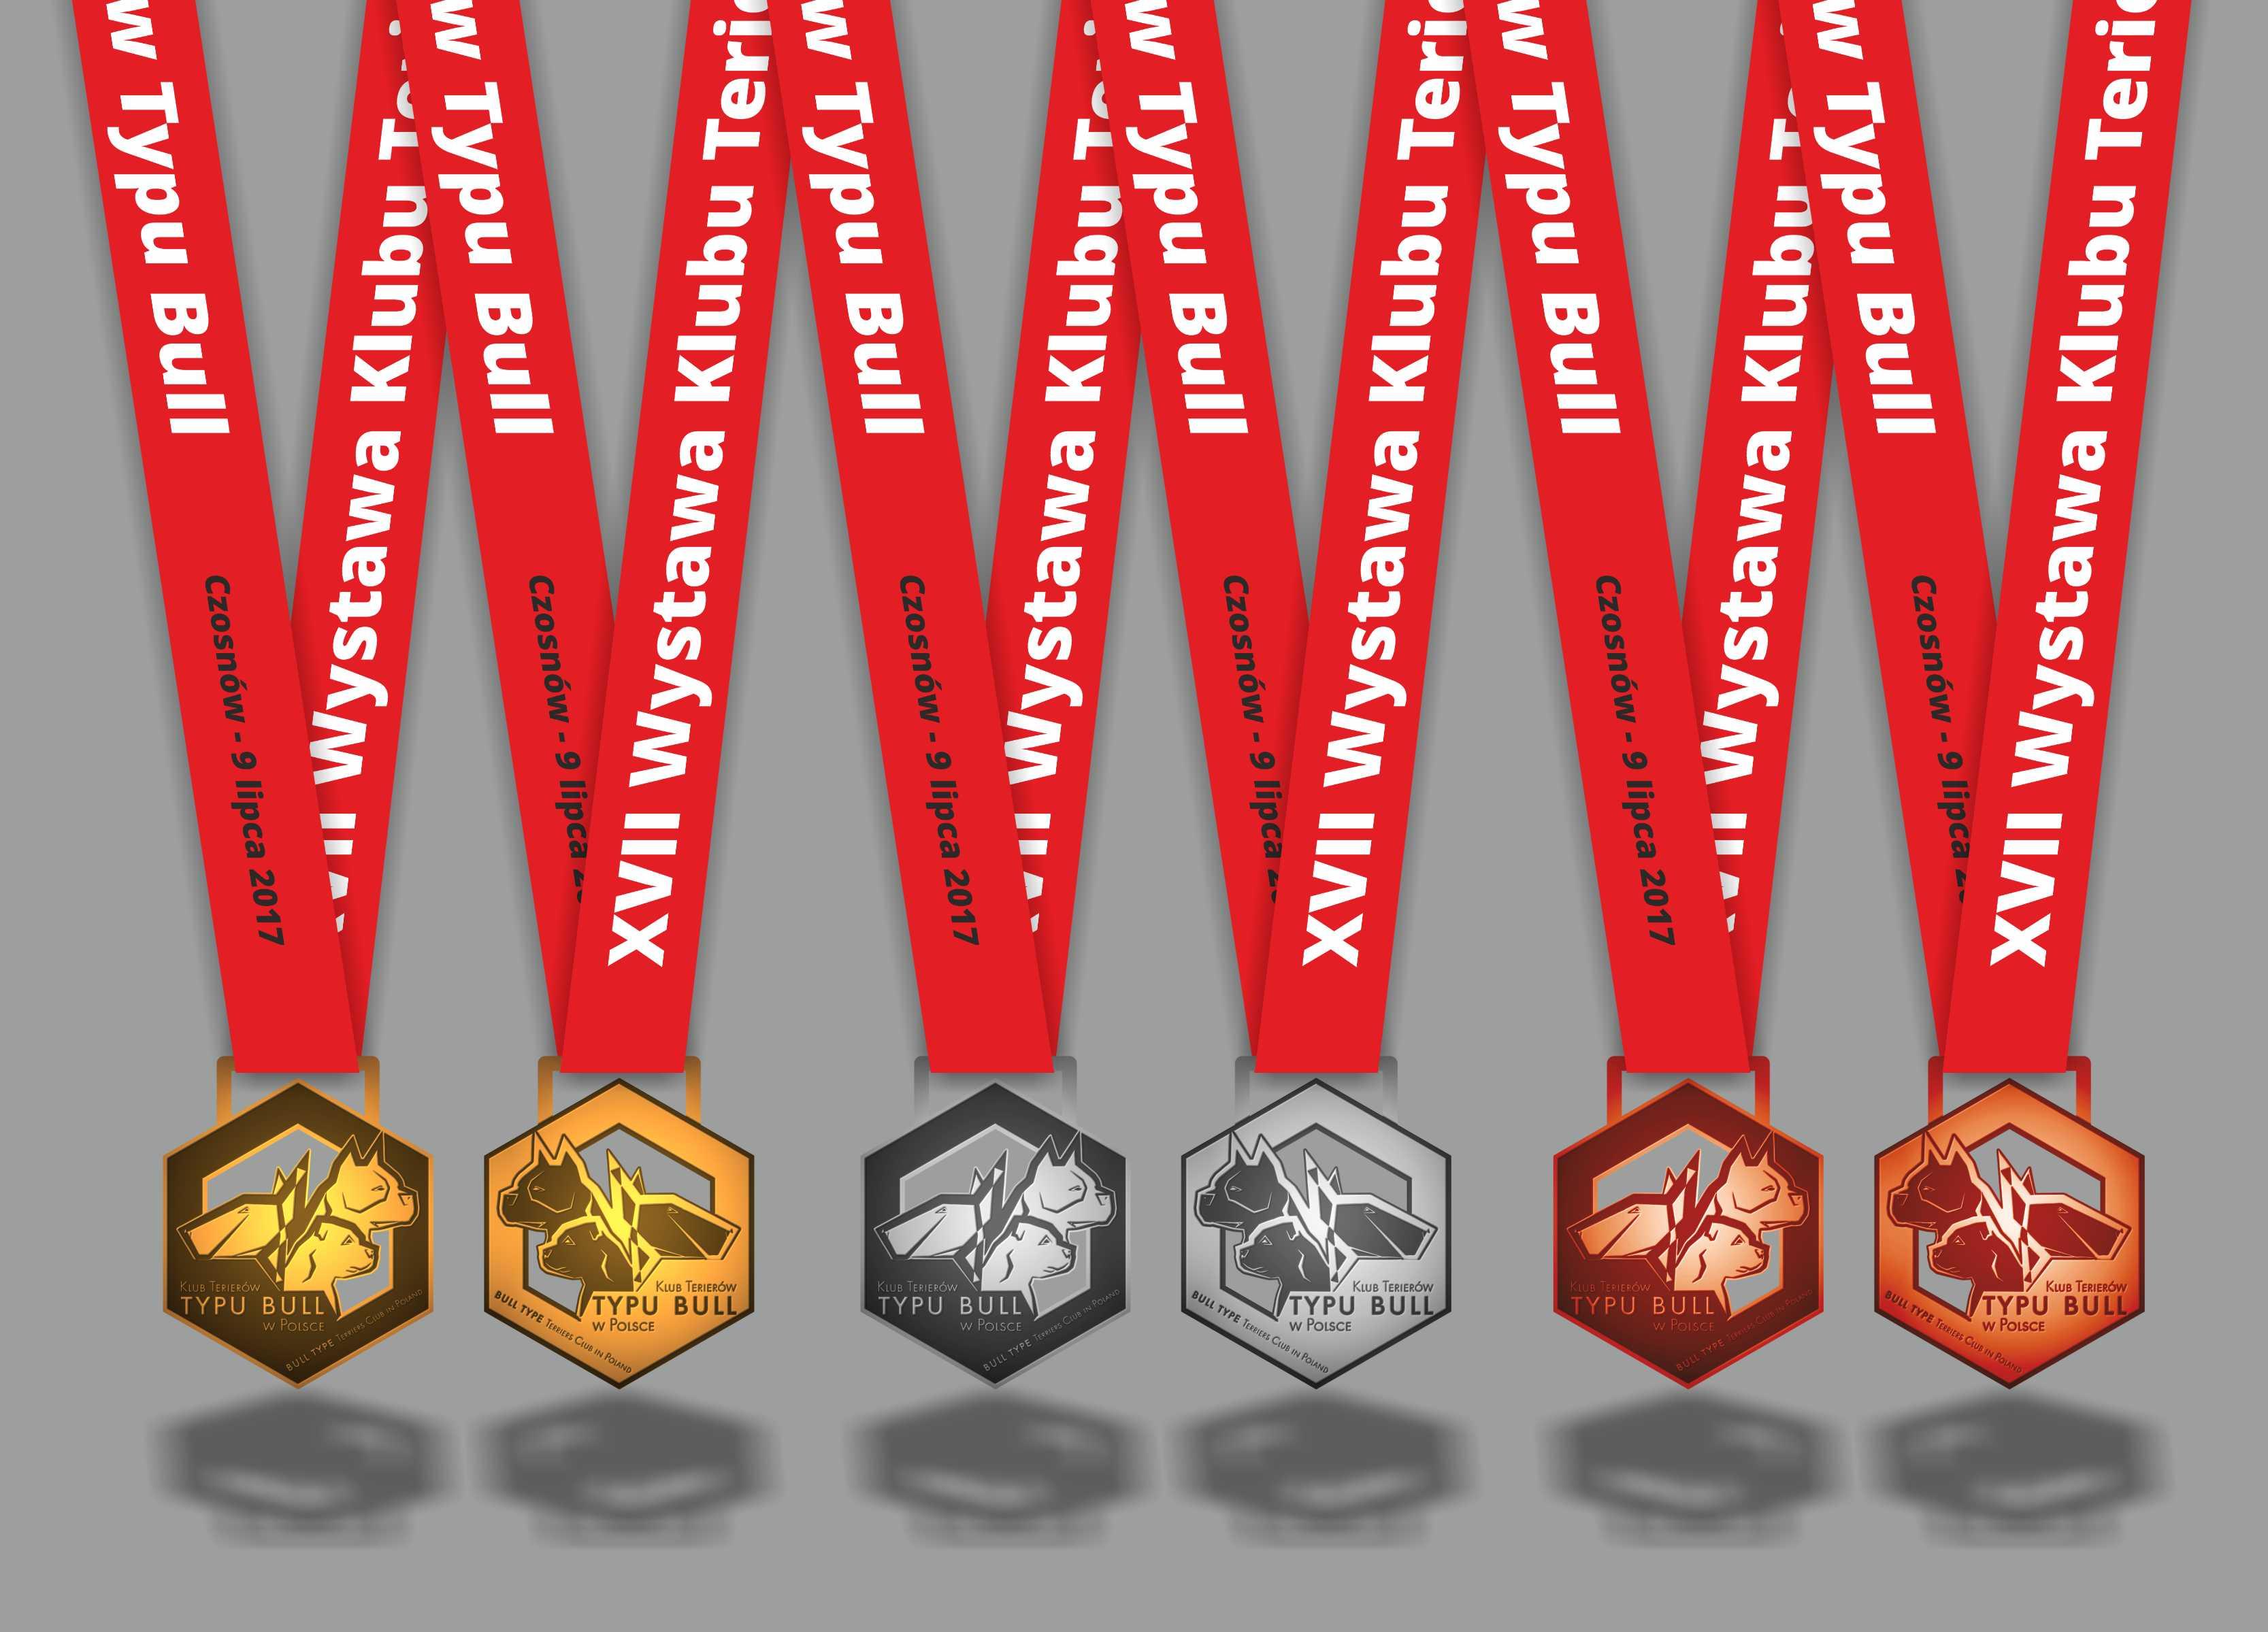 KTTB medals